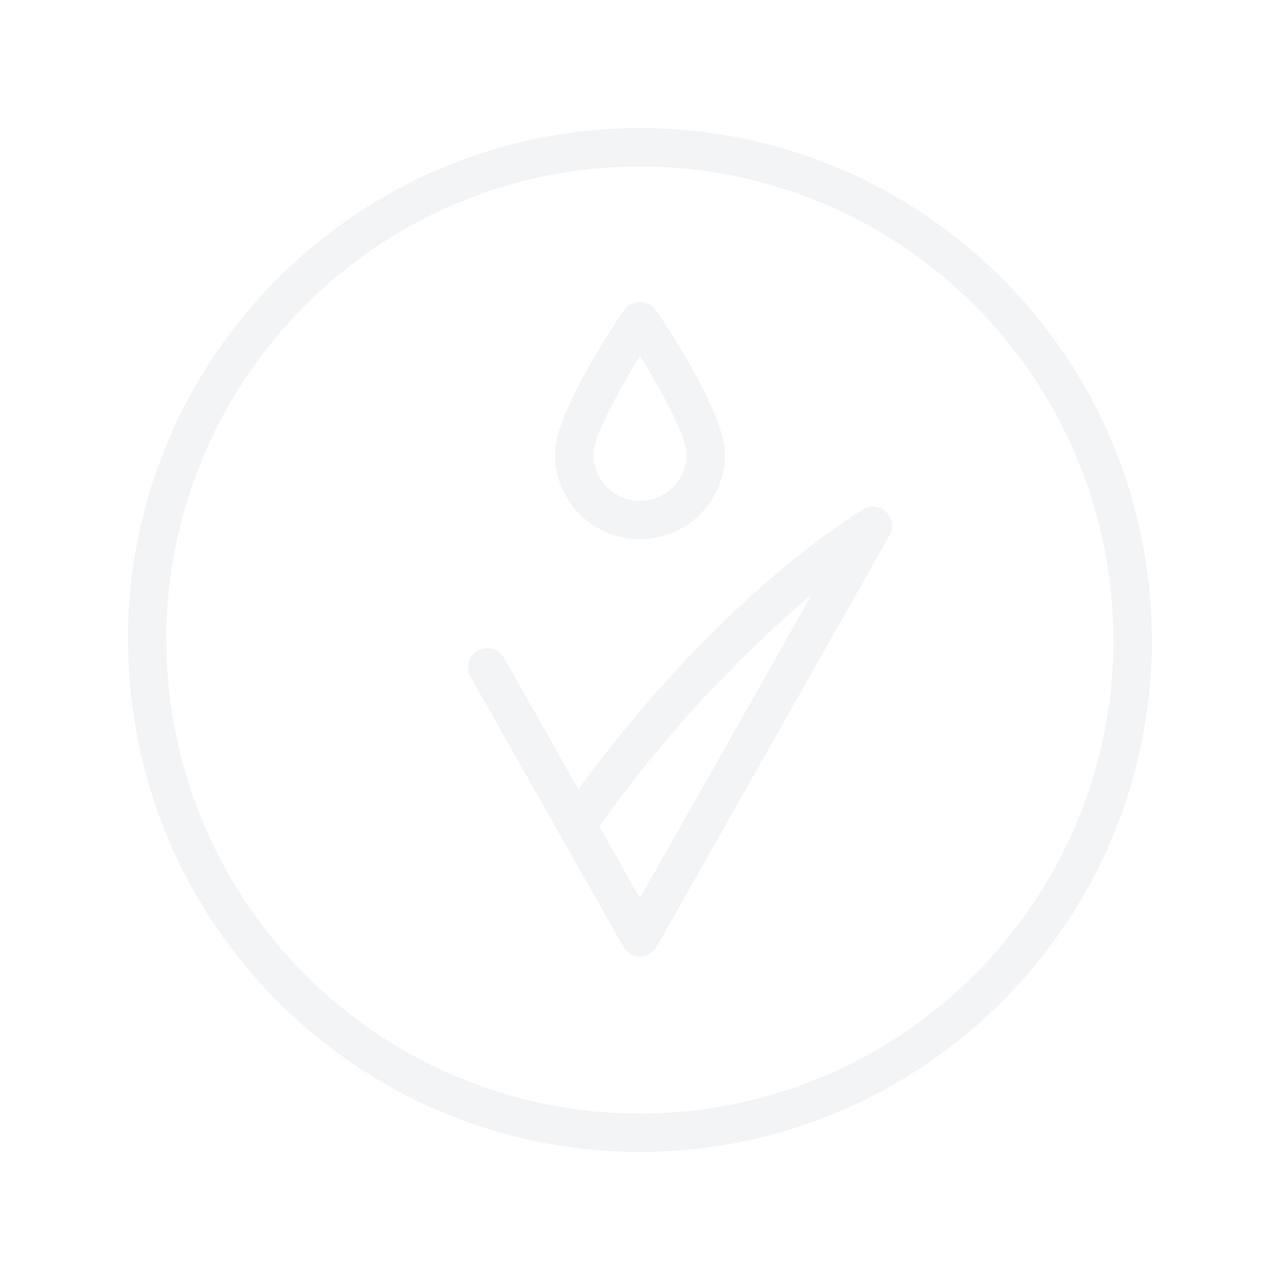 MADARA Boost Amino-Fill 3D Lifting Ampoules 10x3ml